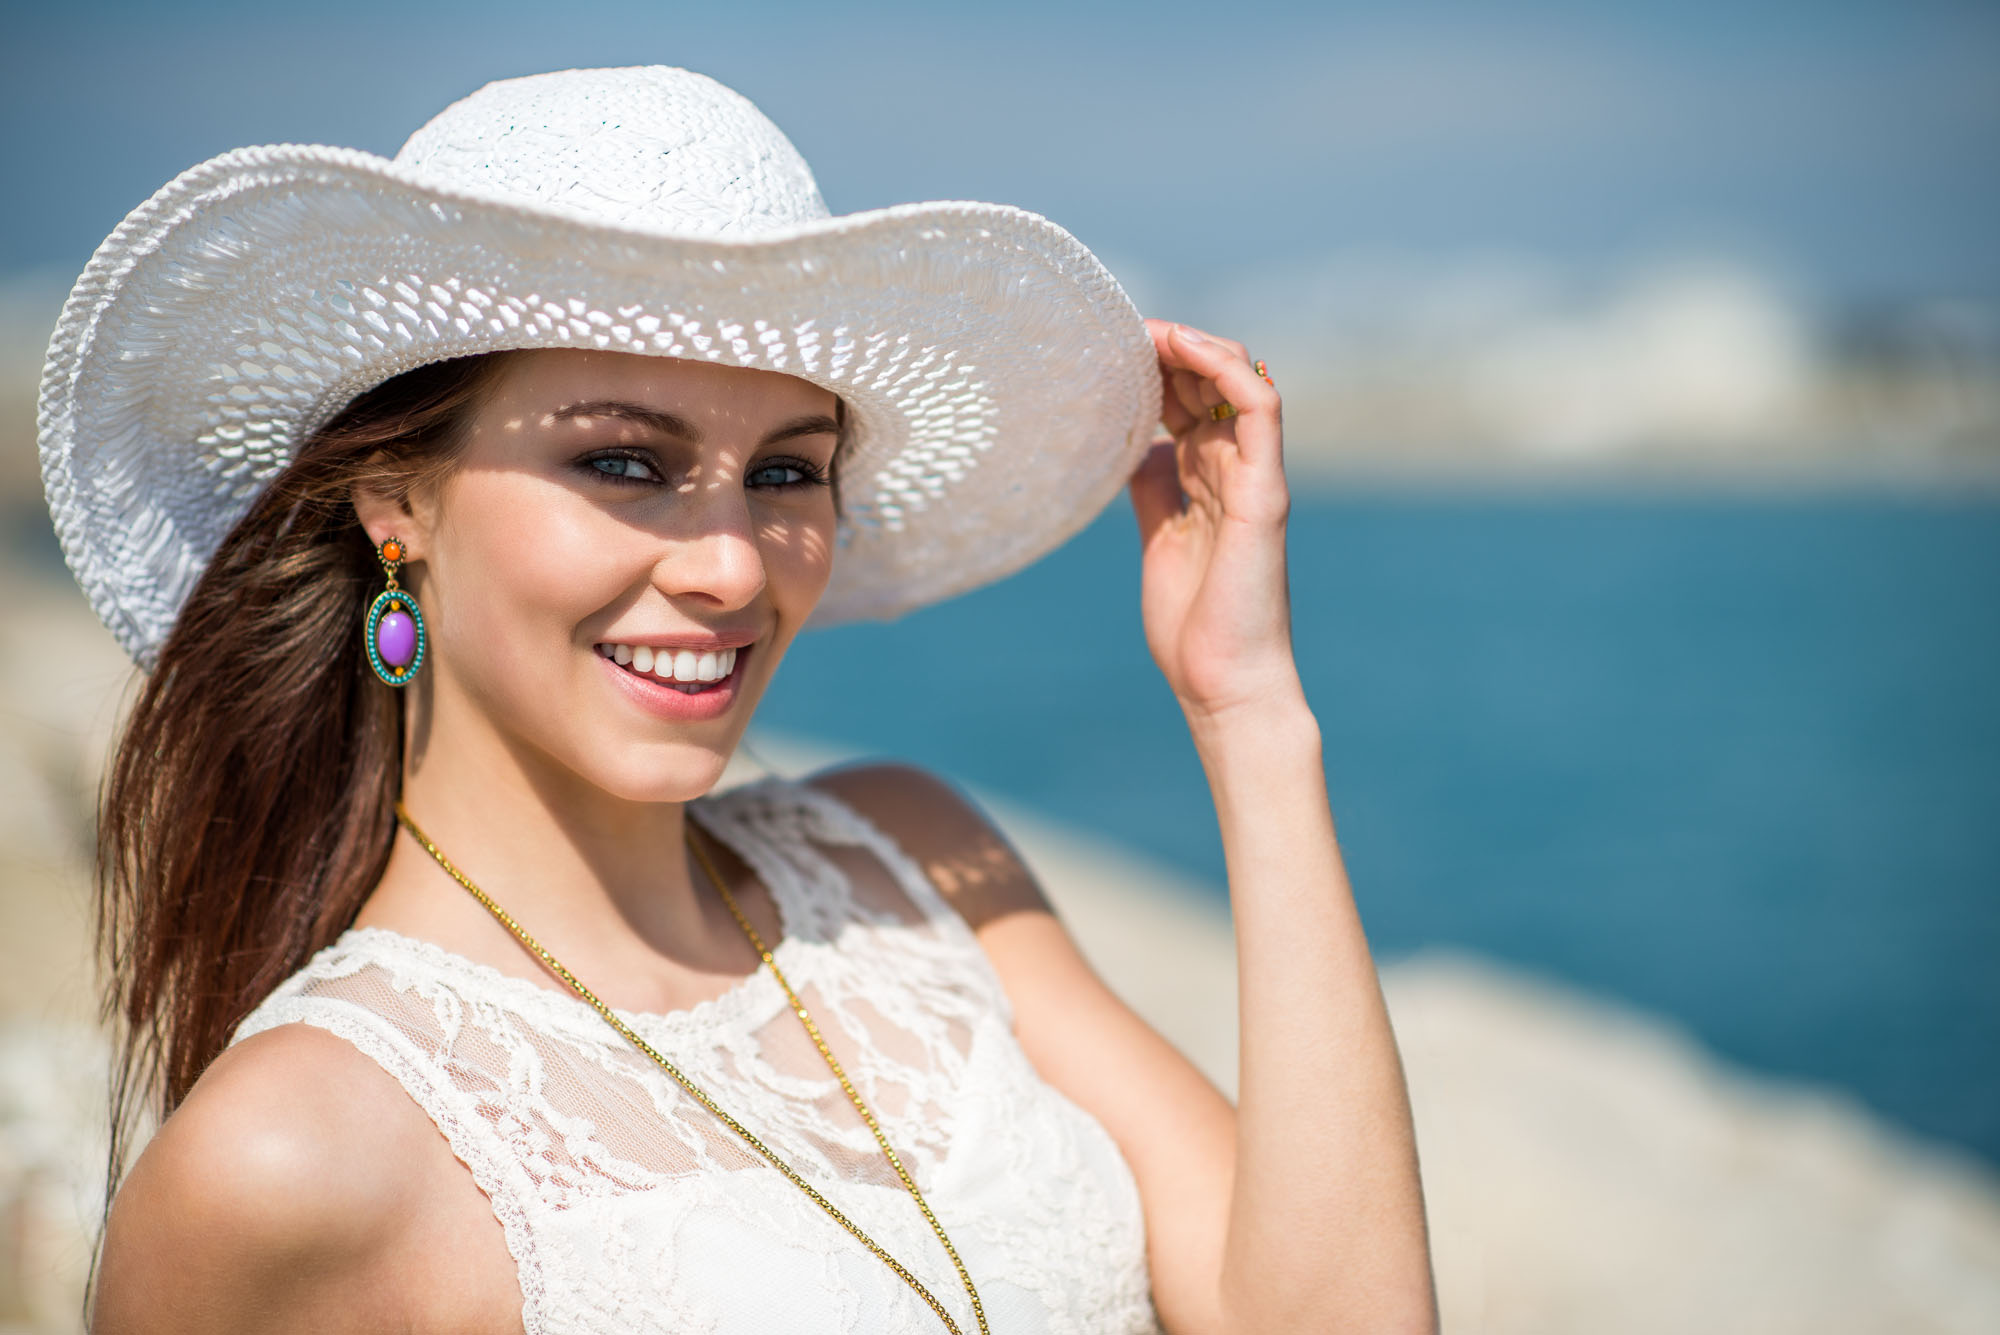 Noba-zomer-2014-modellen-Alicia-small-JPG-009.jpg